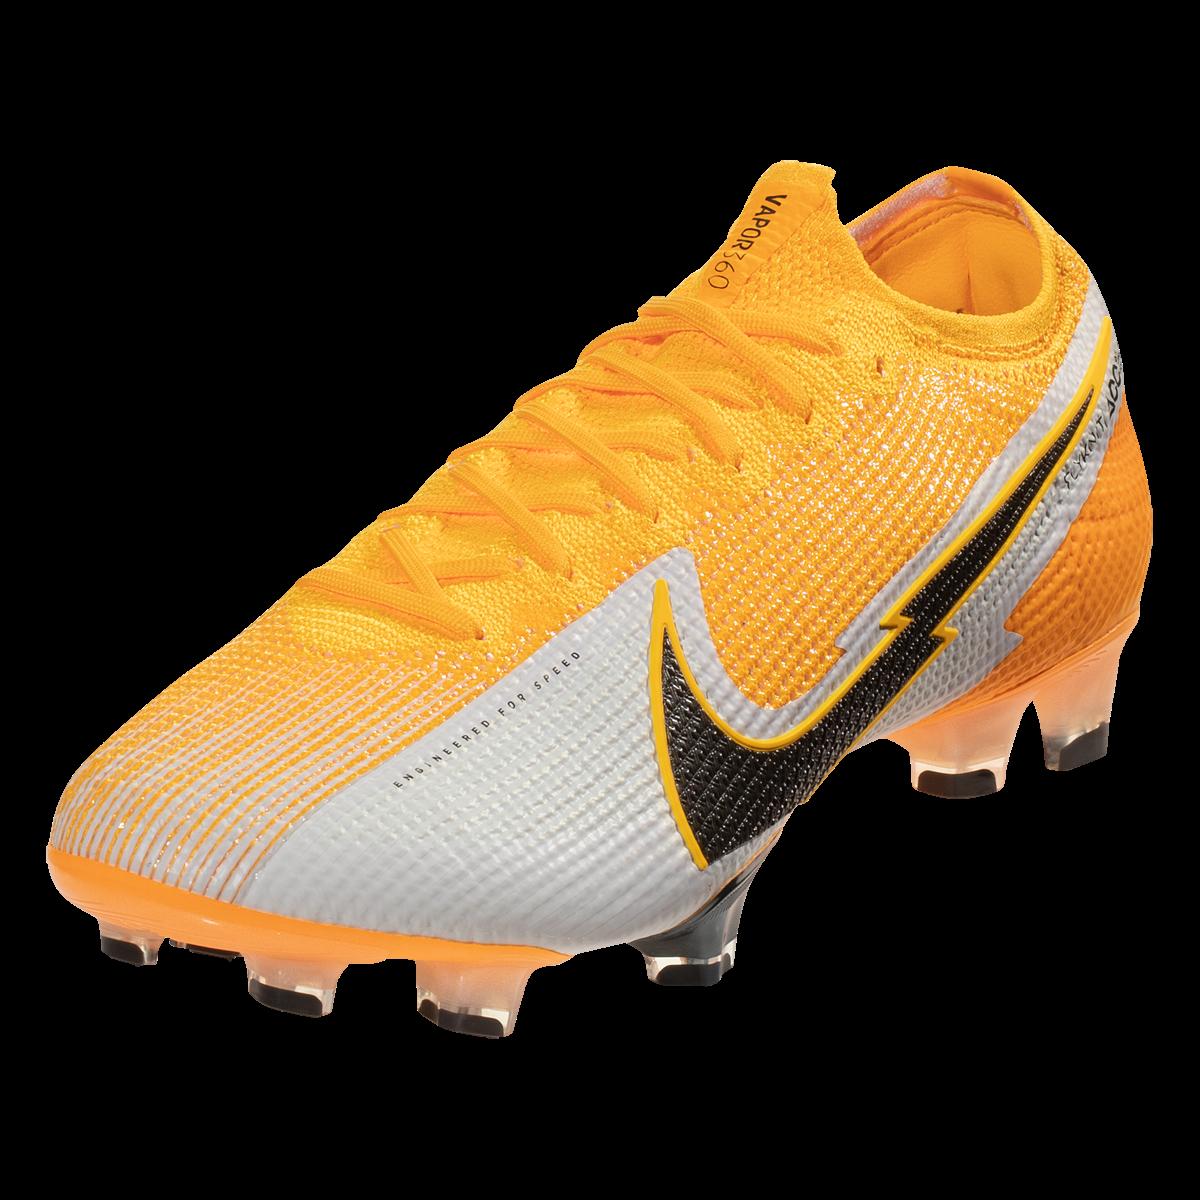 Nike Mercurial Vapor 13 Elite Fg Soccer Cleat Laser Orange Black White Soccer Com In 2021 Cleats Soccer Cleats Football Boots